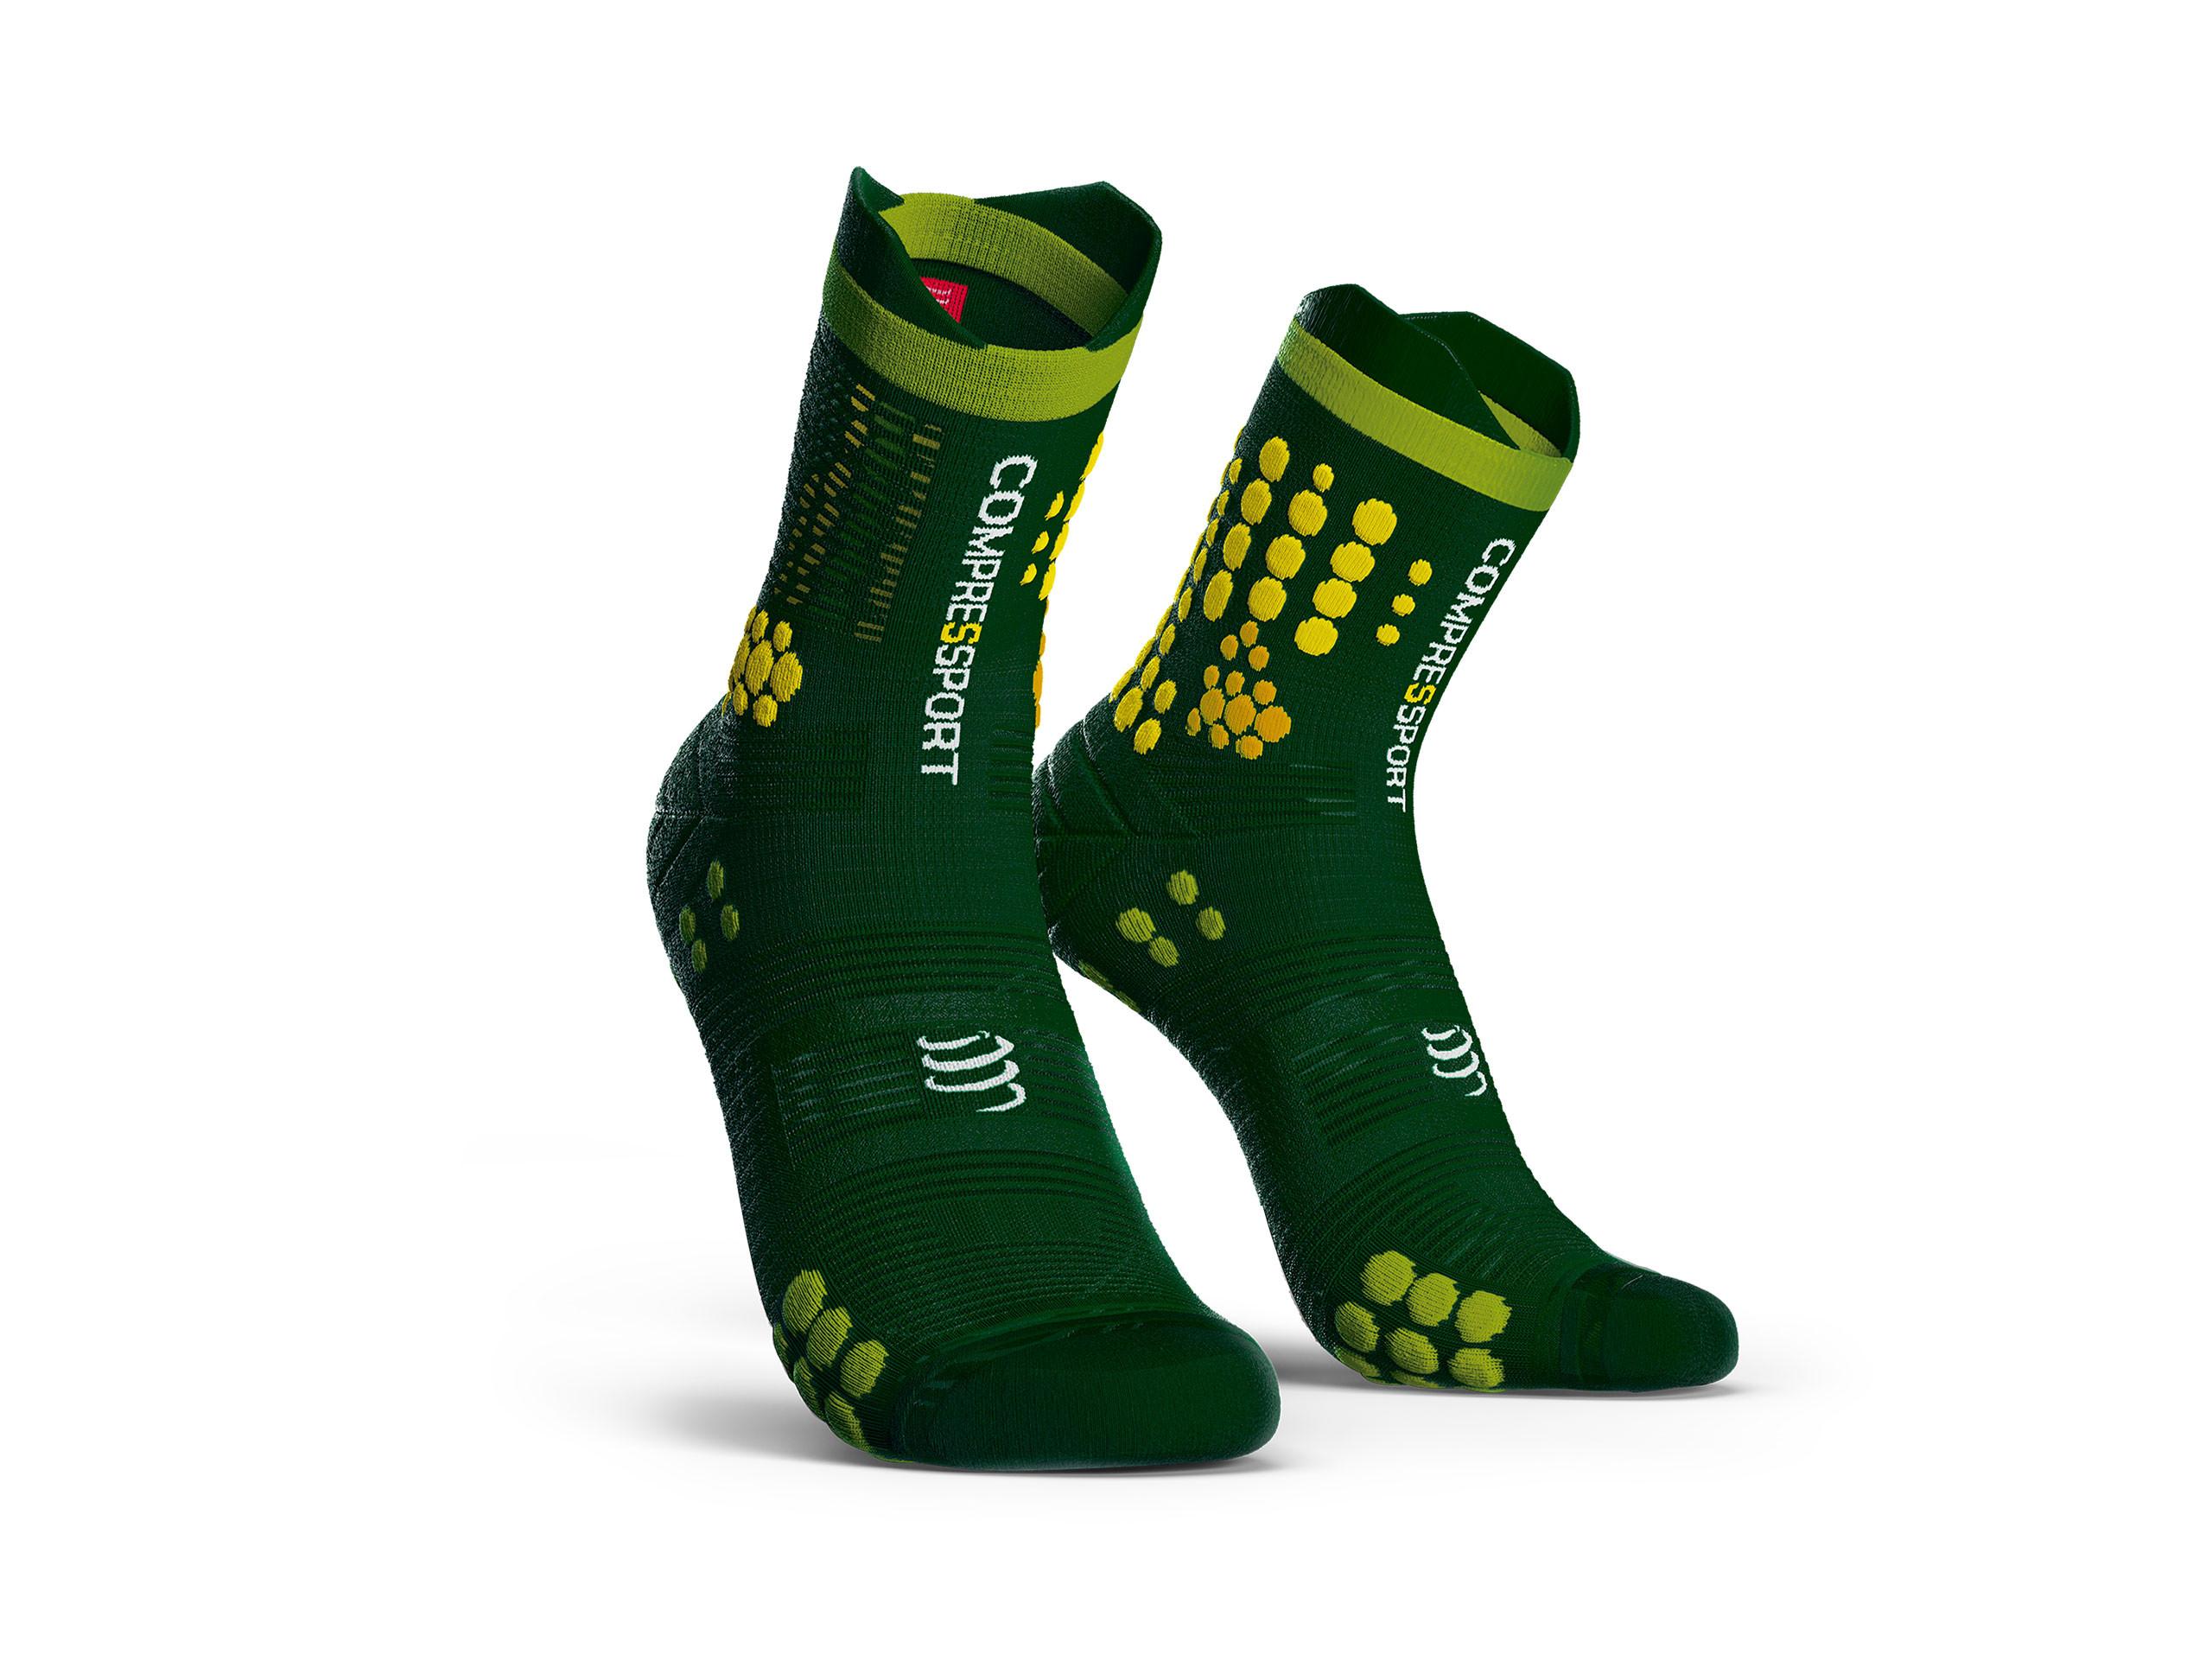 Pro racing socks v3.0 green/yellow